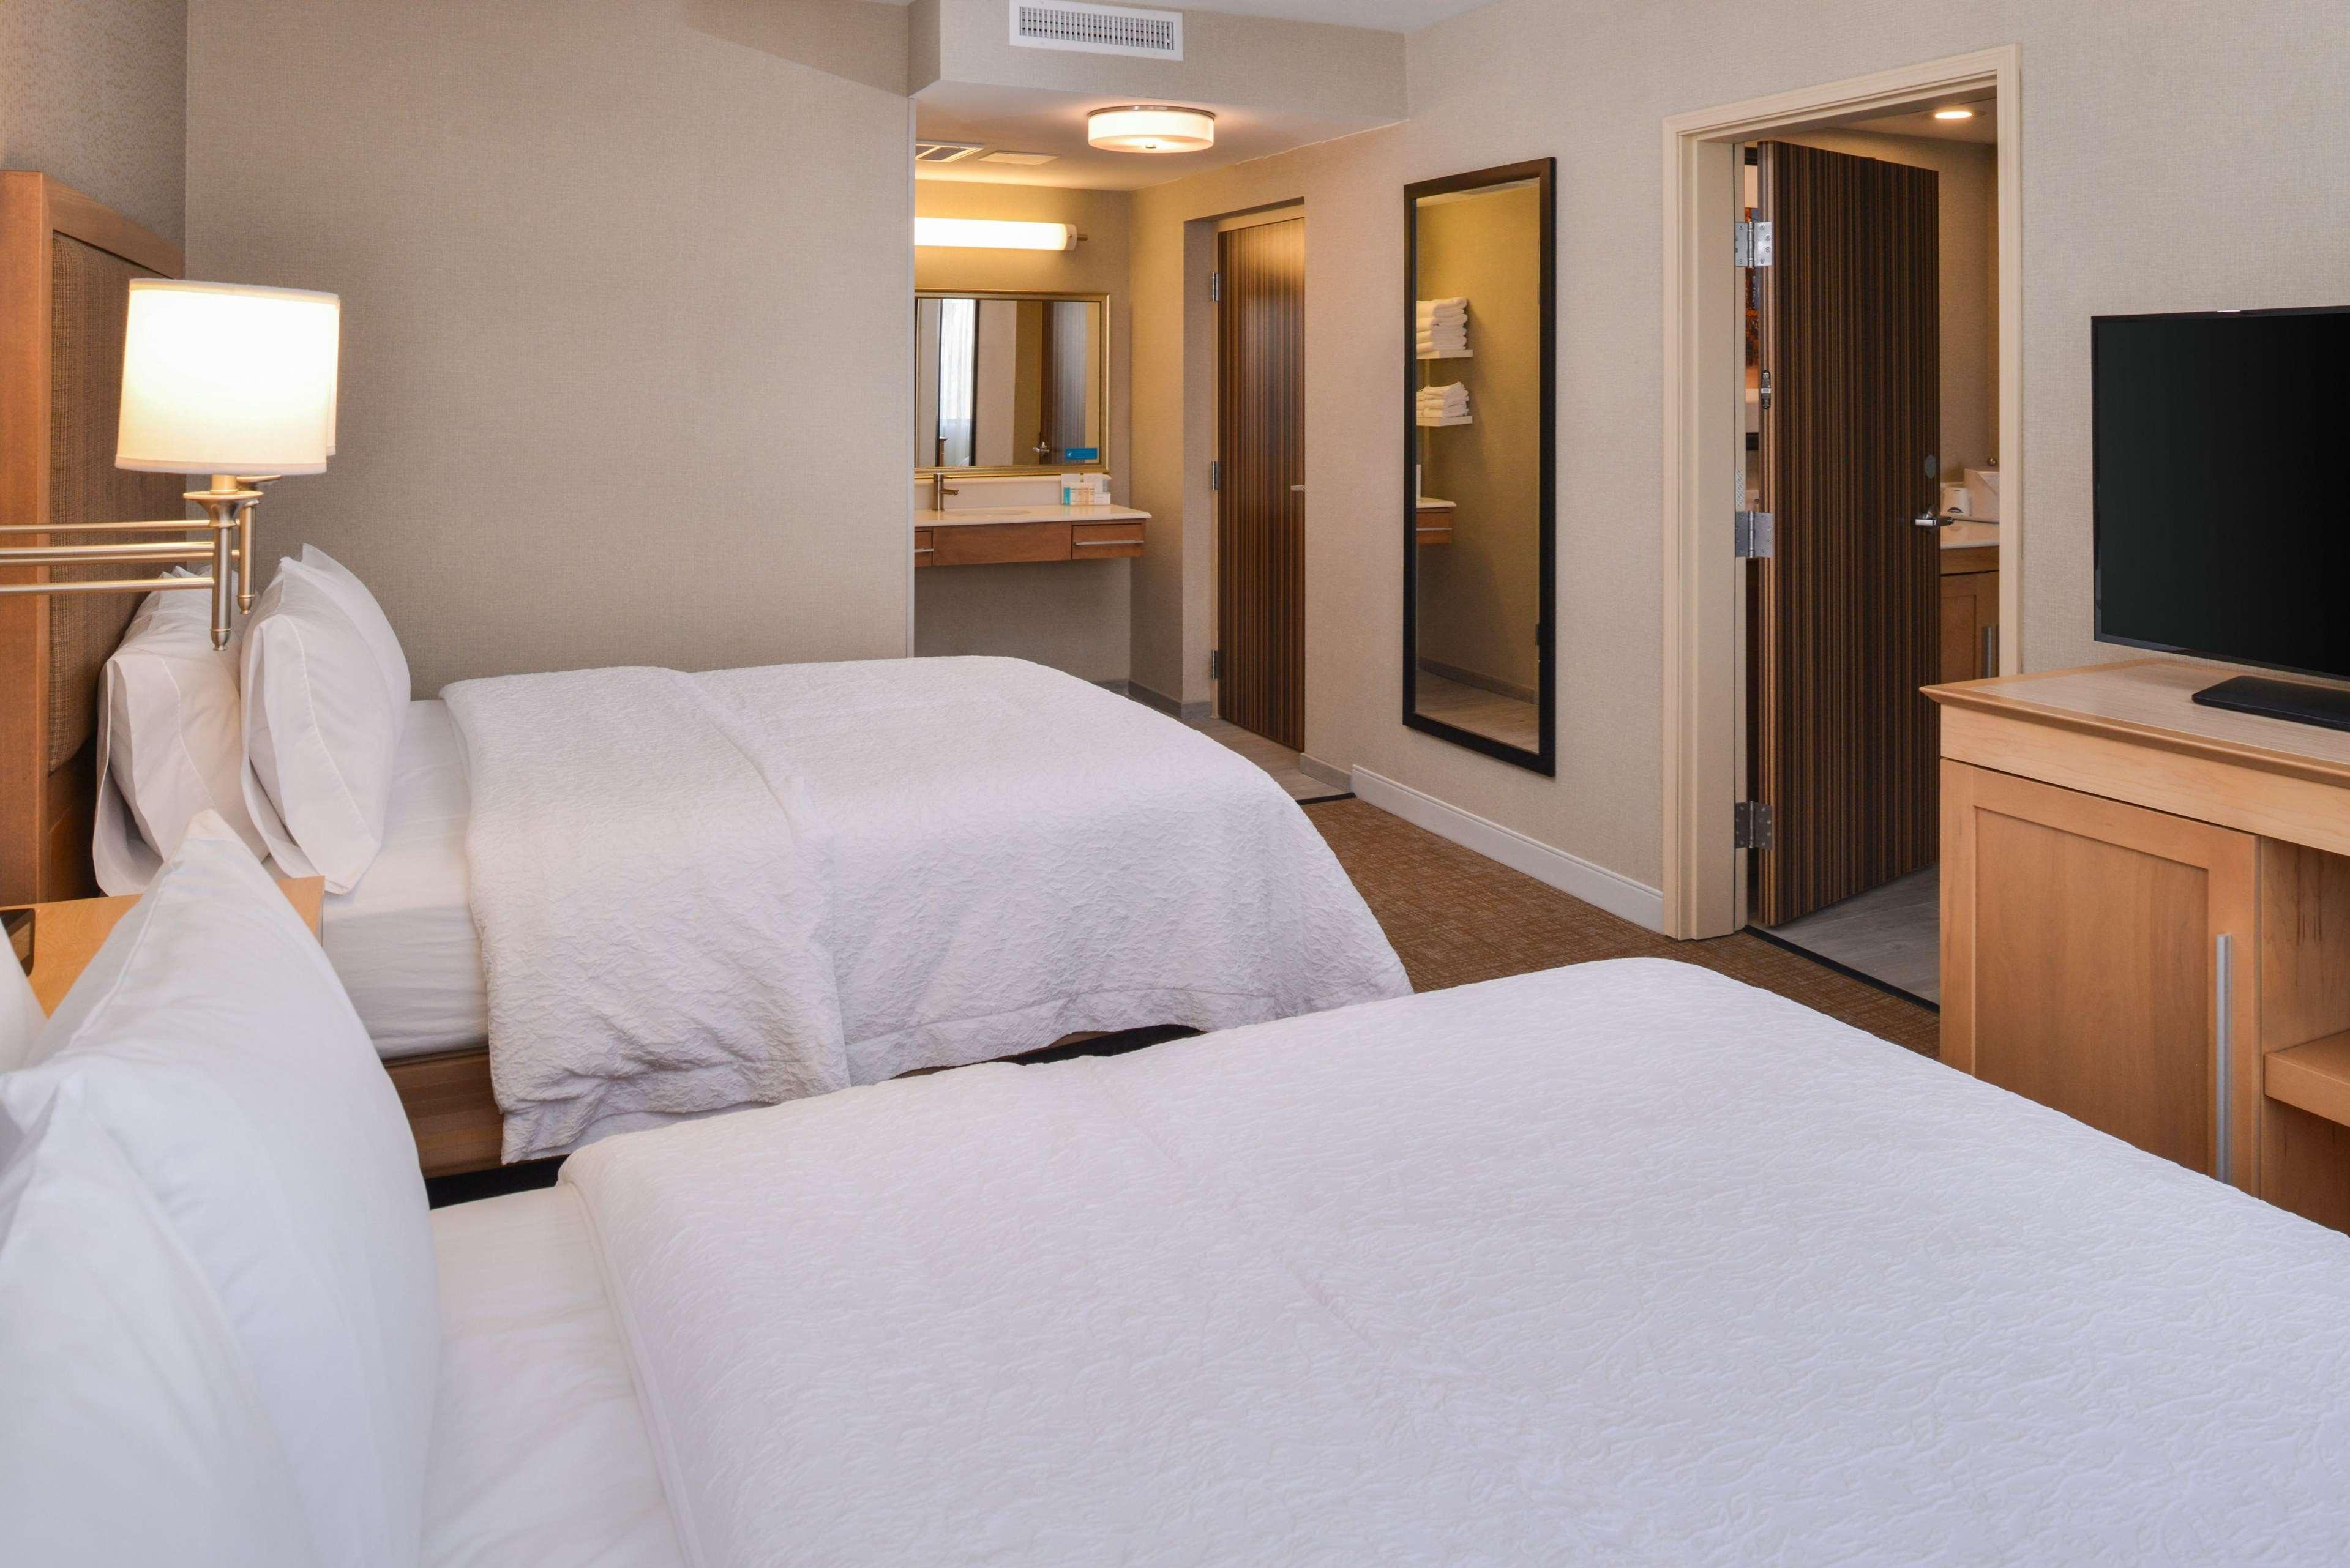 Hampton Inn & Suites Denver-Speer Boulevard image 49